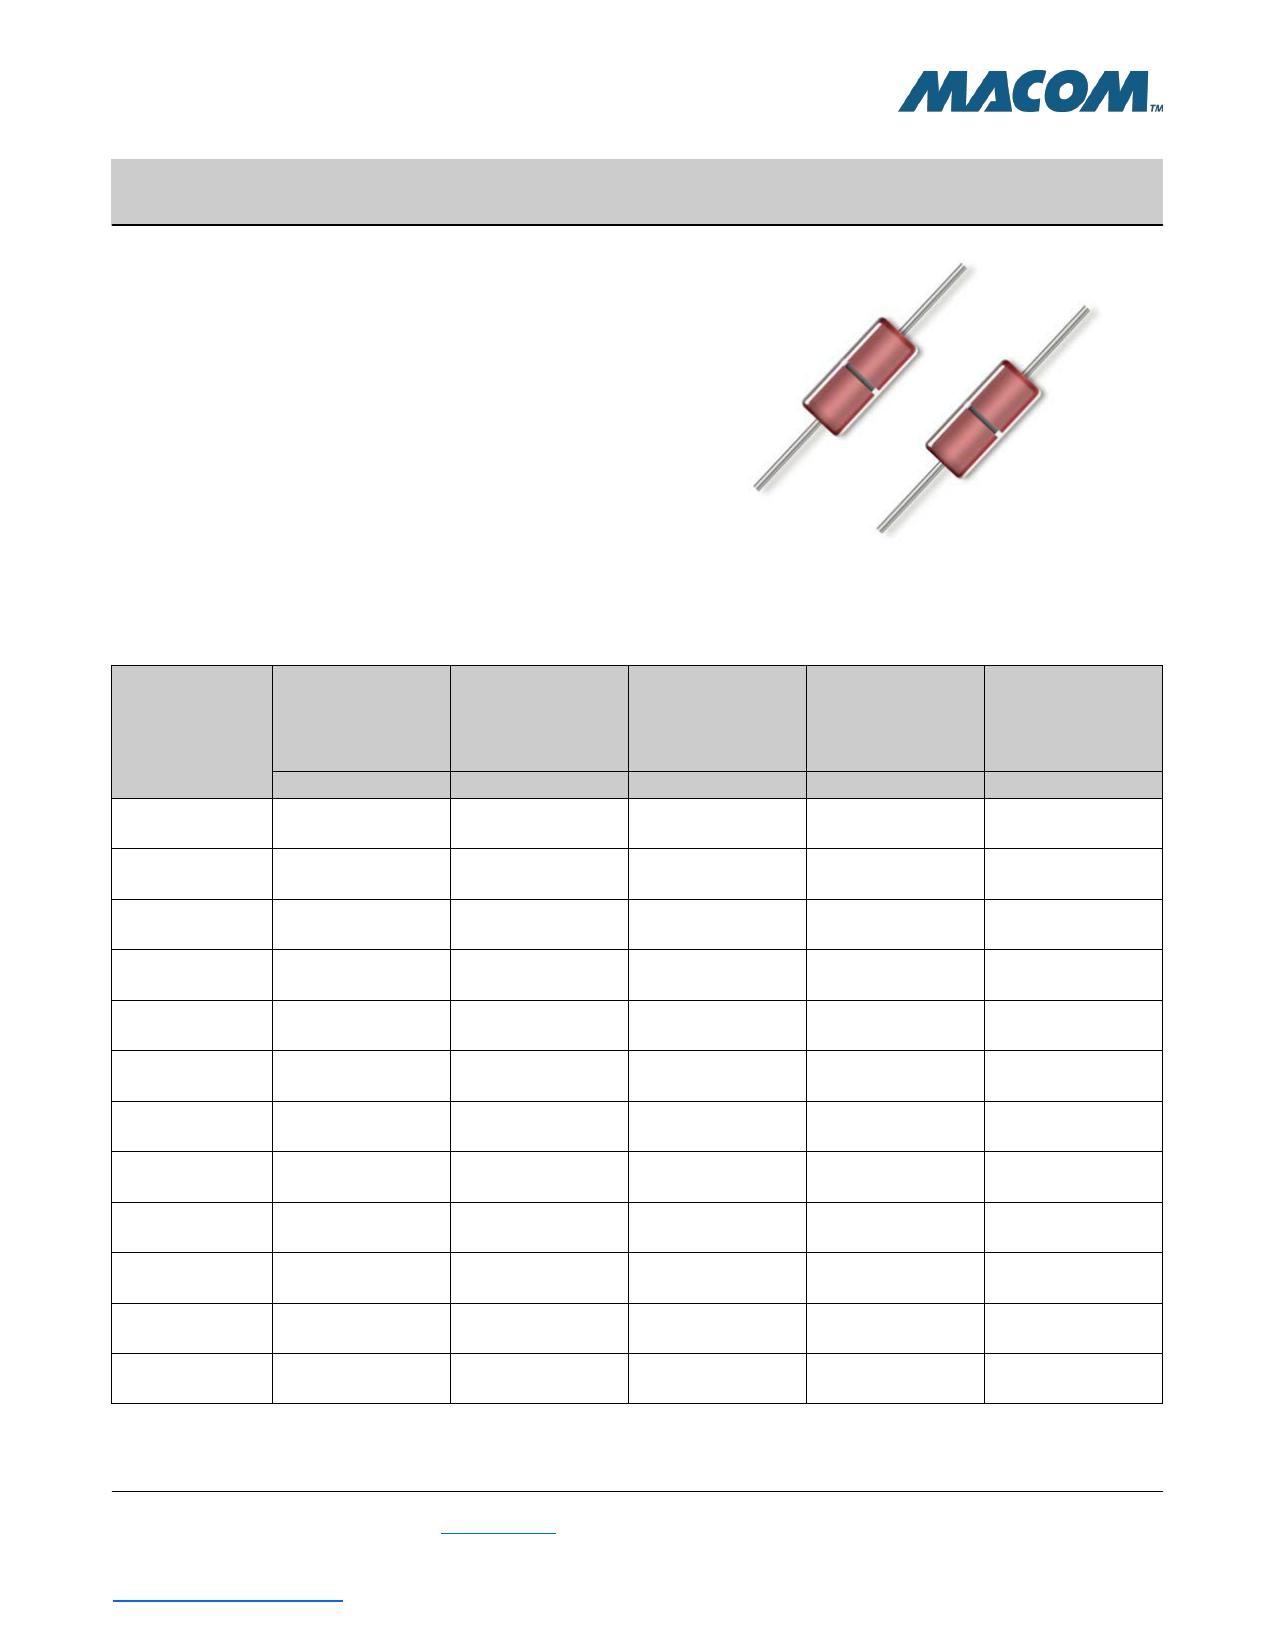 1N4583-1 datasheet